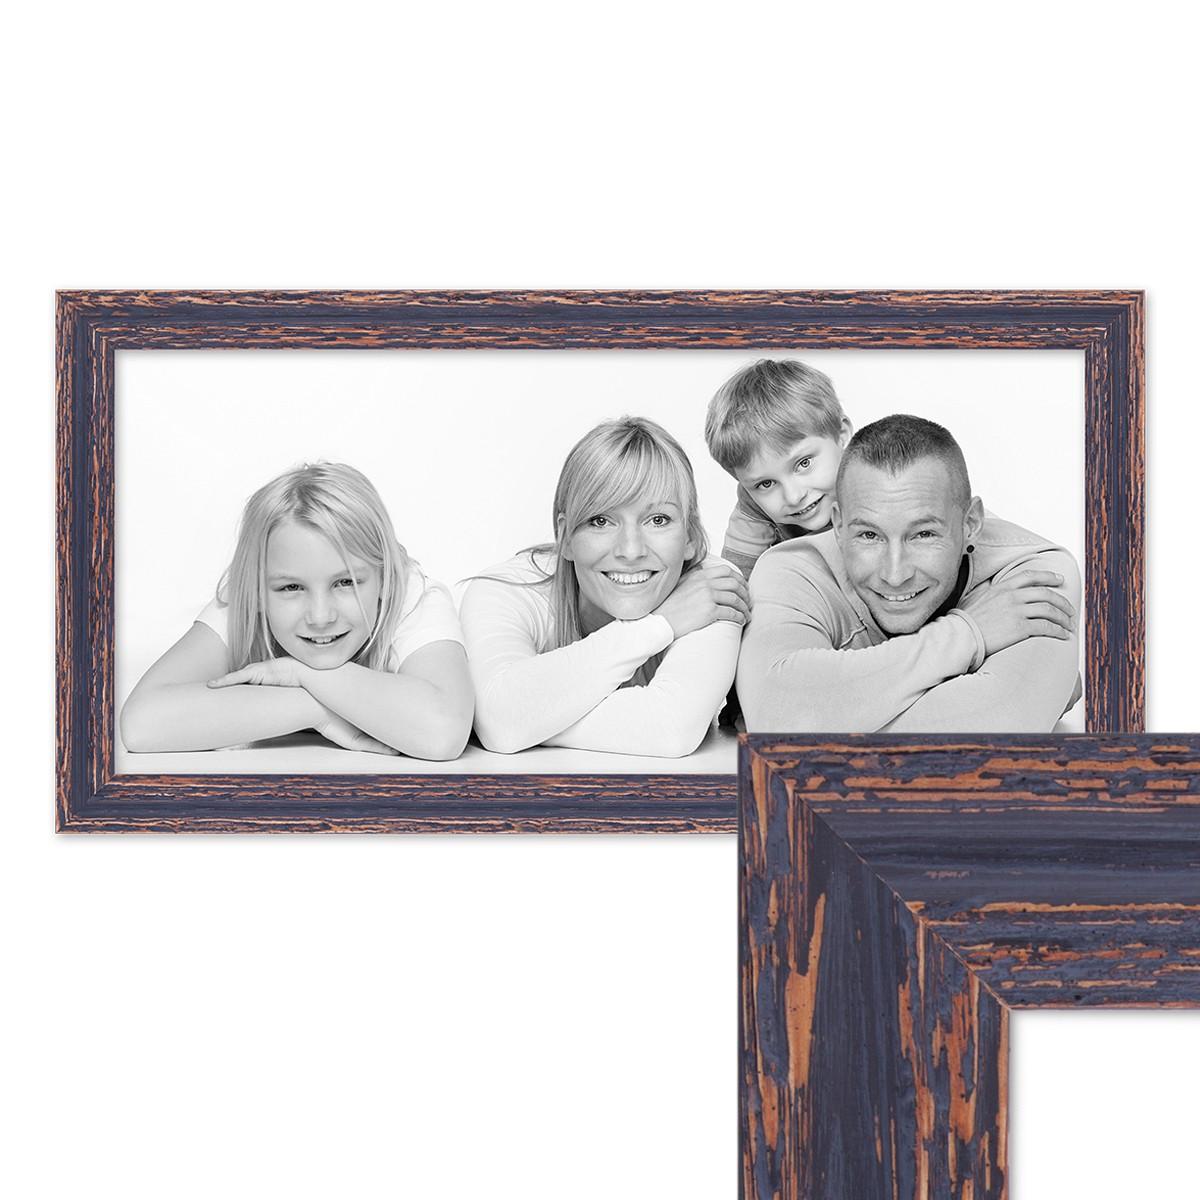 Panorama-Bilderrahmen Vintage 30x60 cm Holz Dunkelbraun Shabby-Chic ...